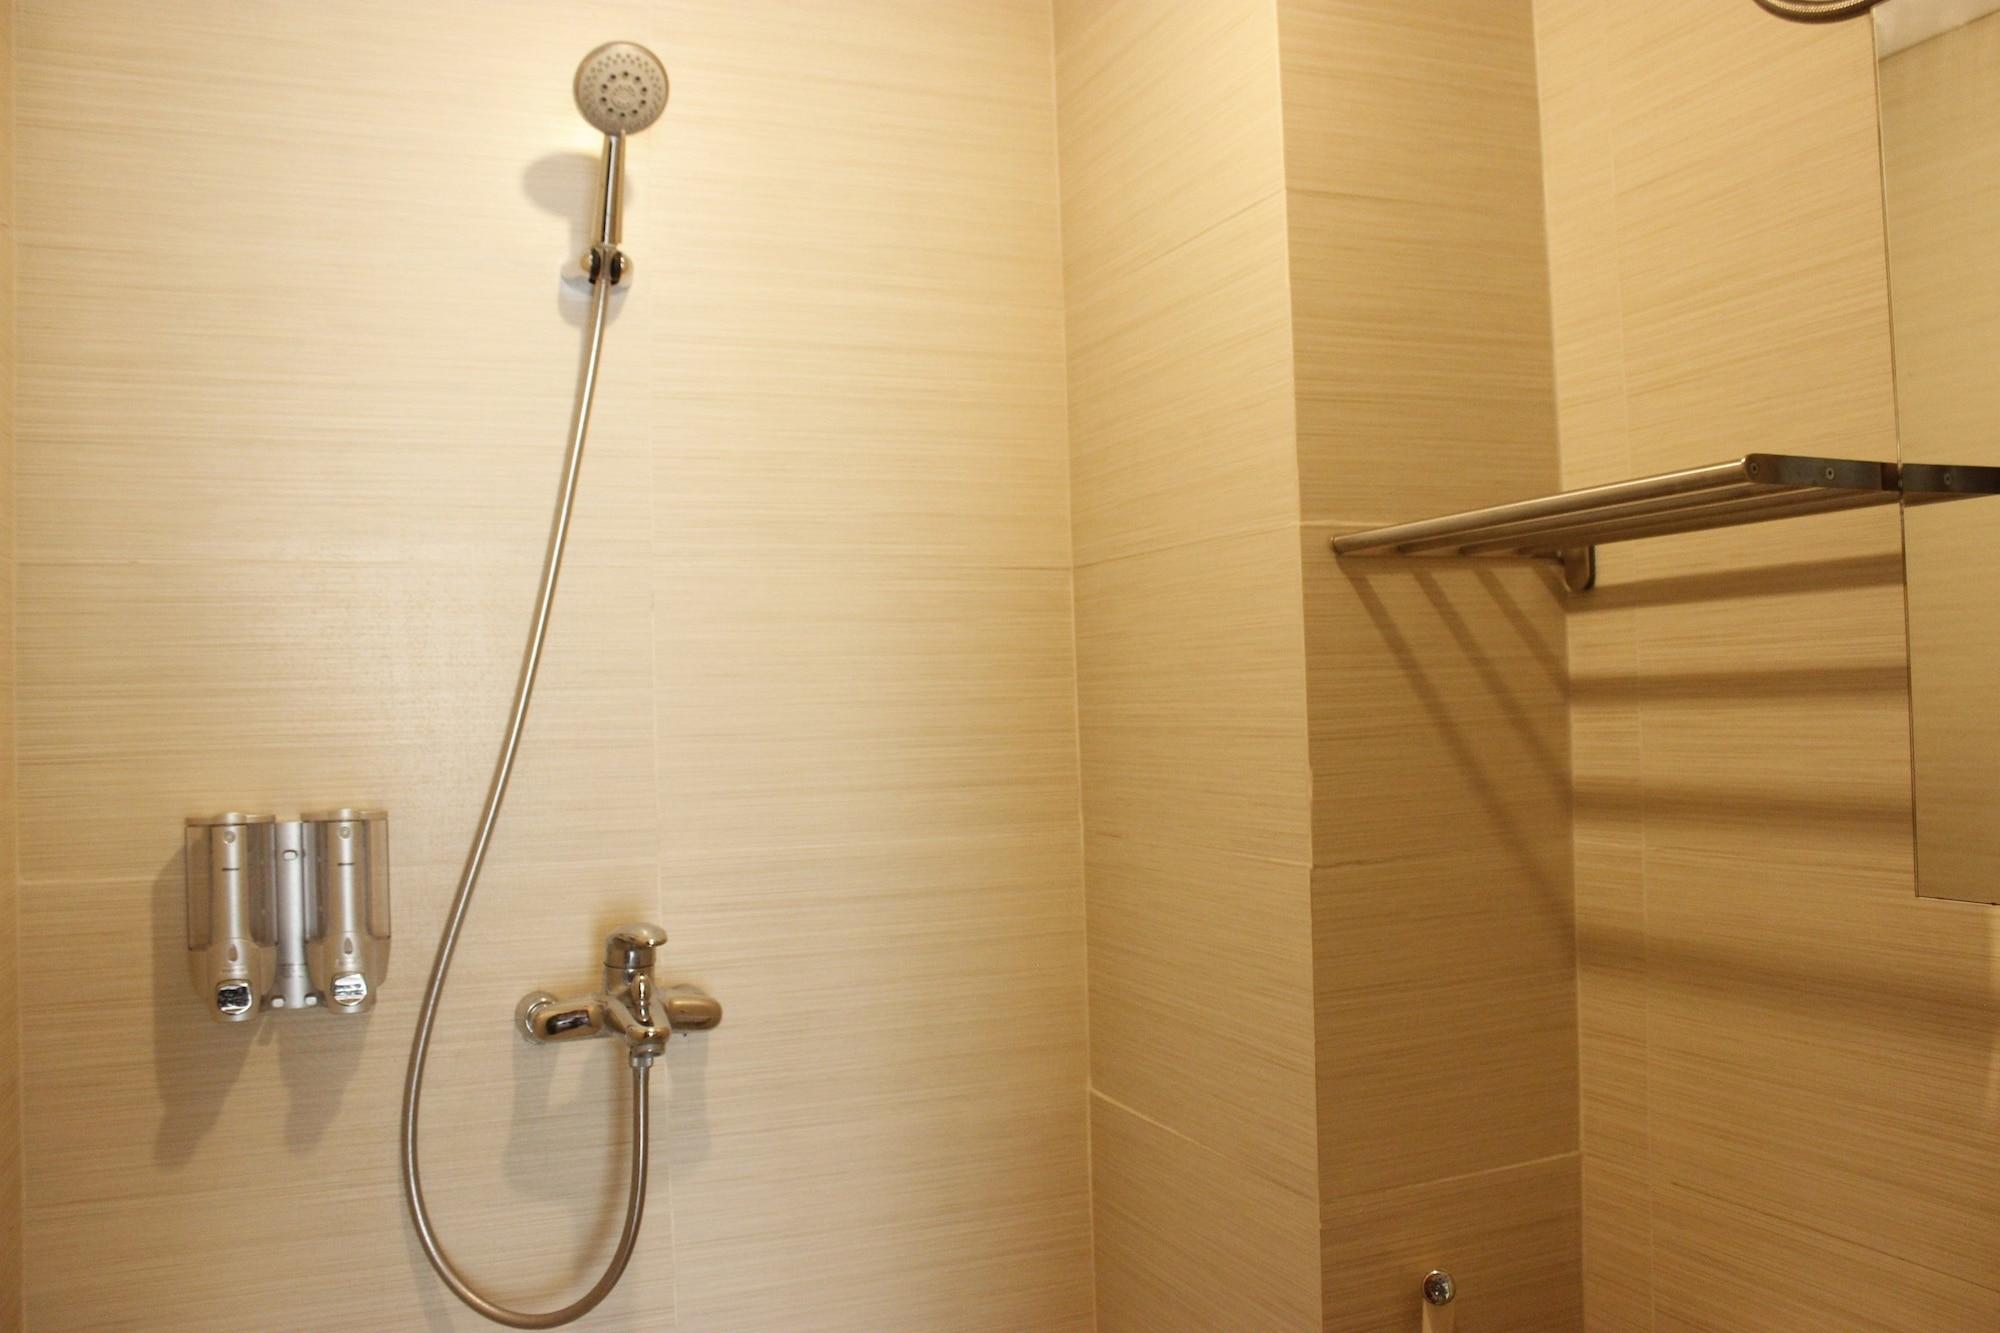 Exquisite 1BR Apartment at Gateway Pasteur, Cimahi